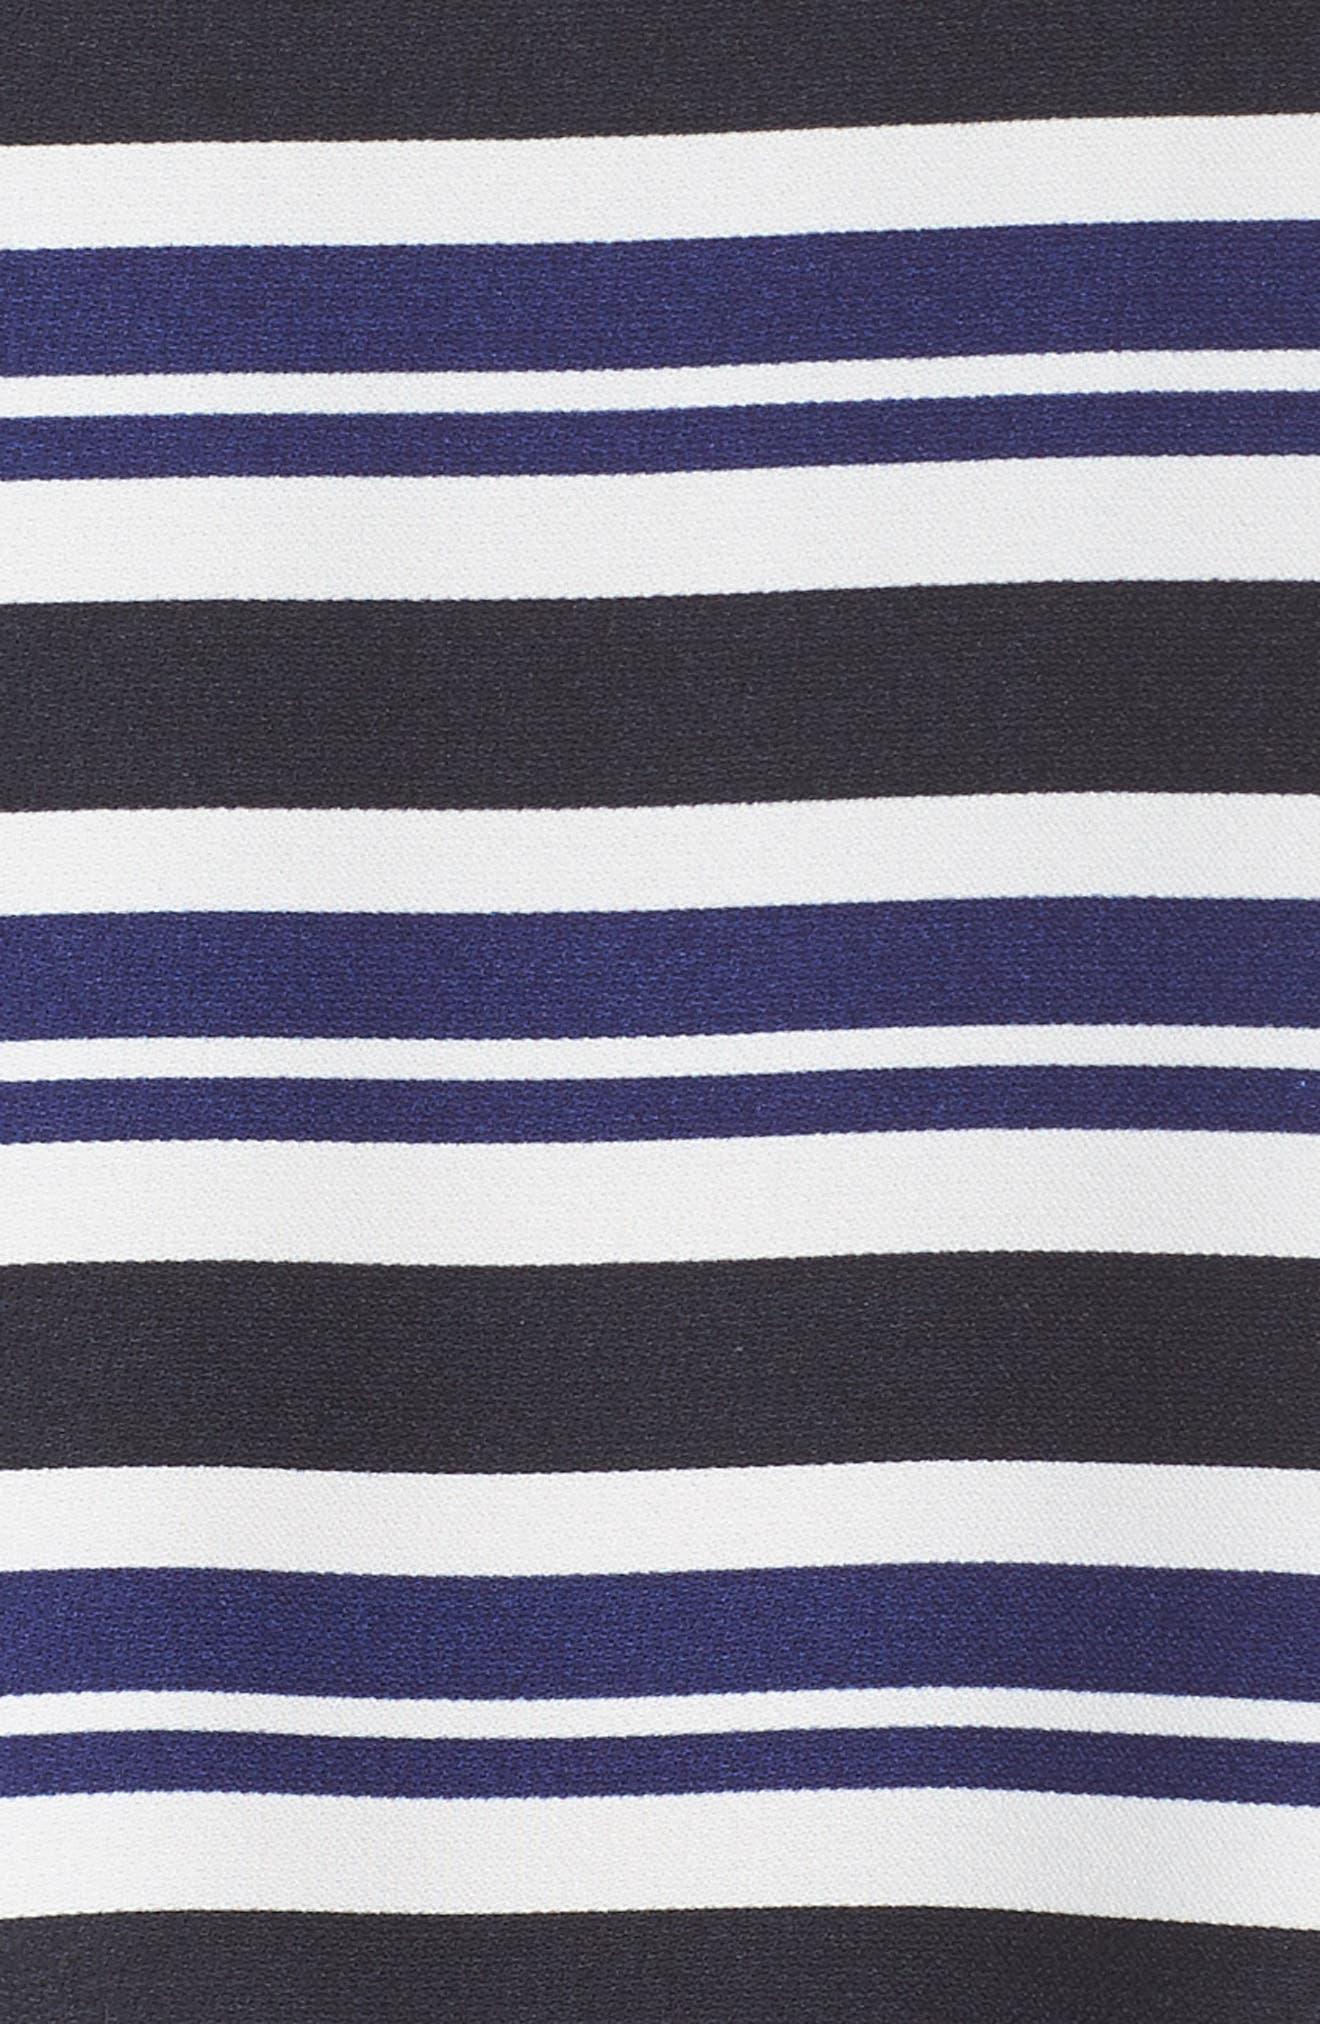 Stripe Mixed Media Top,                             Alternate thumbnail 6, color,                             411